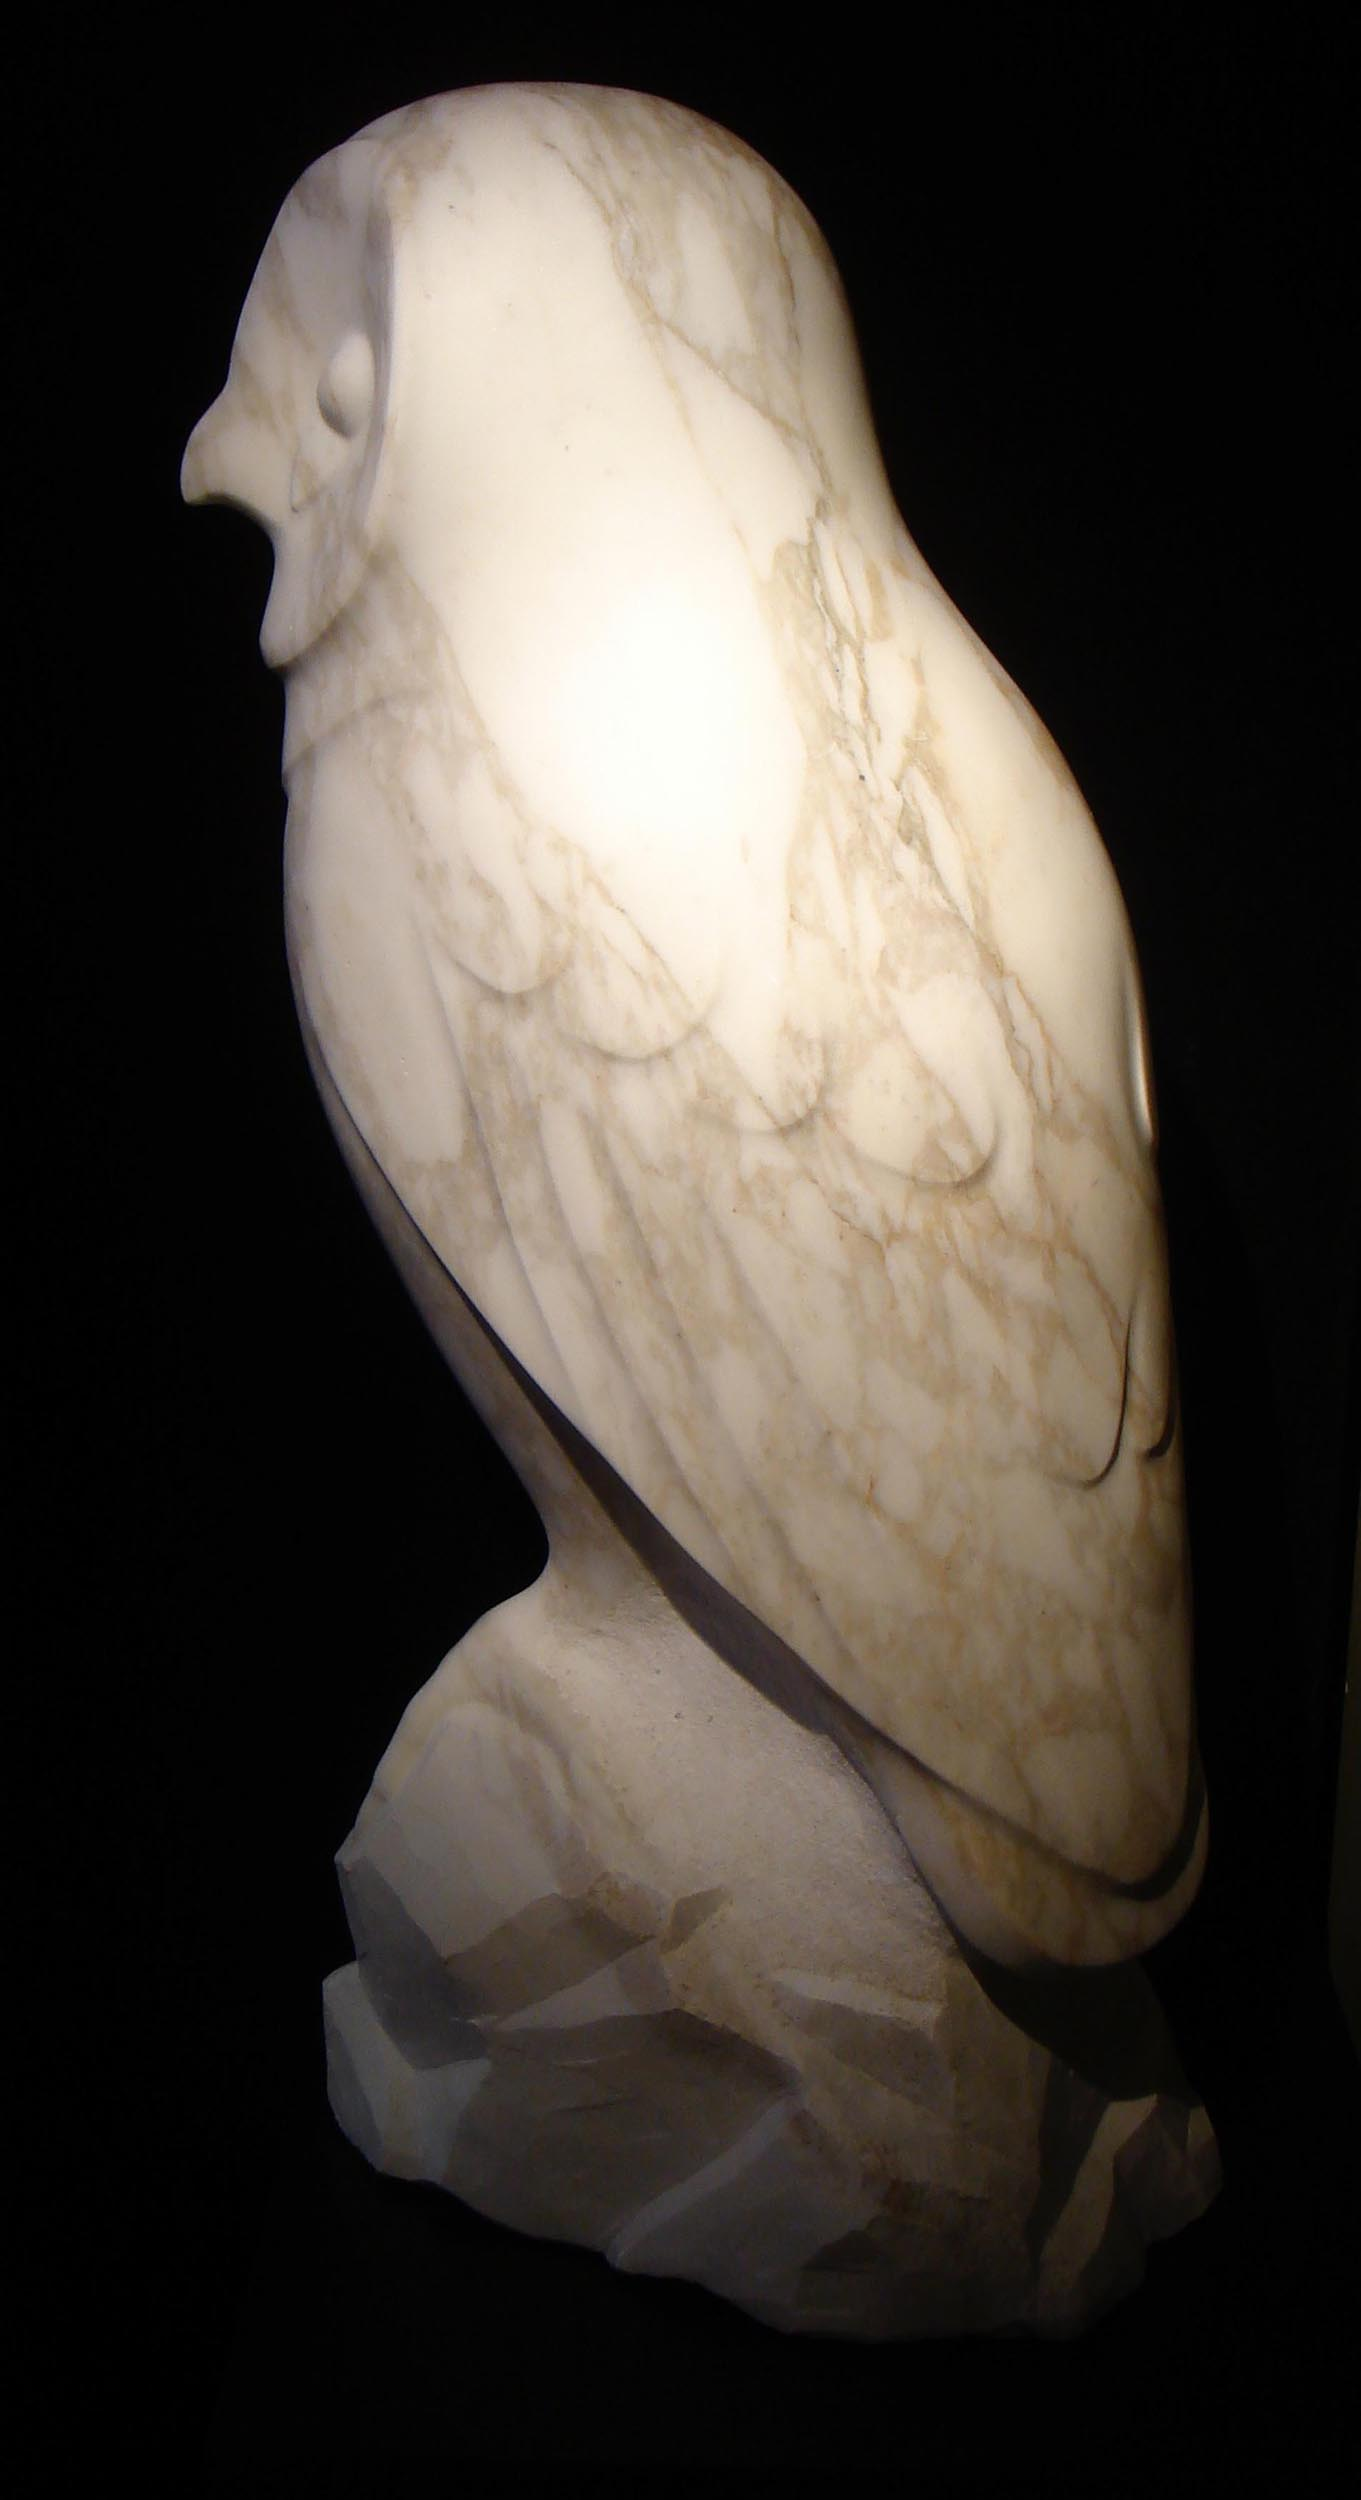 michael binkley sculptor stone sculpture artist barn owl wildlife marble statue vancouver canada